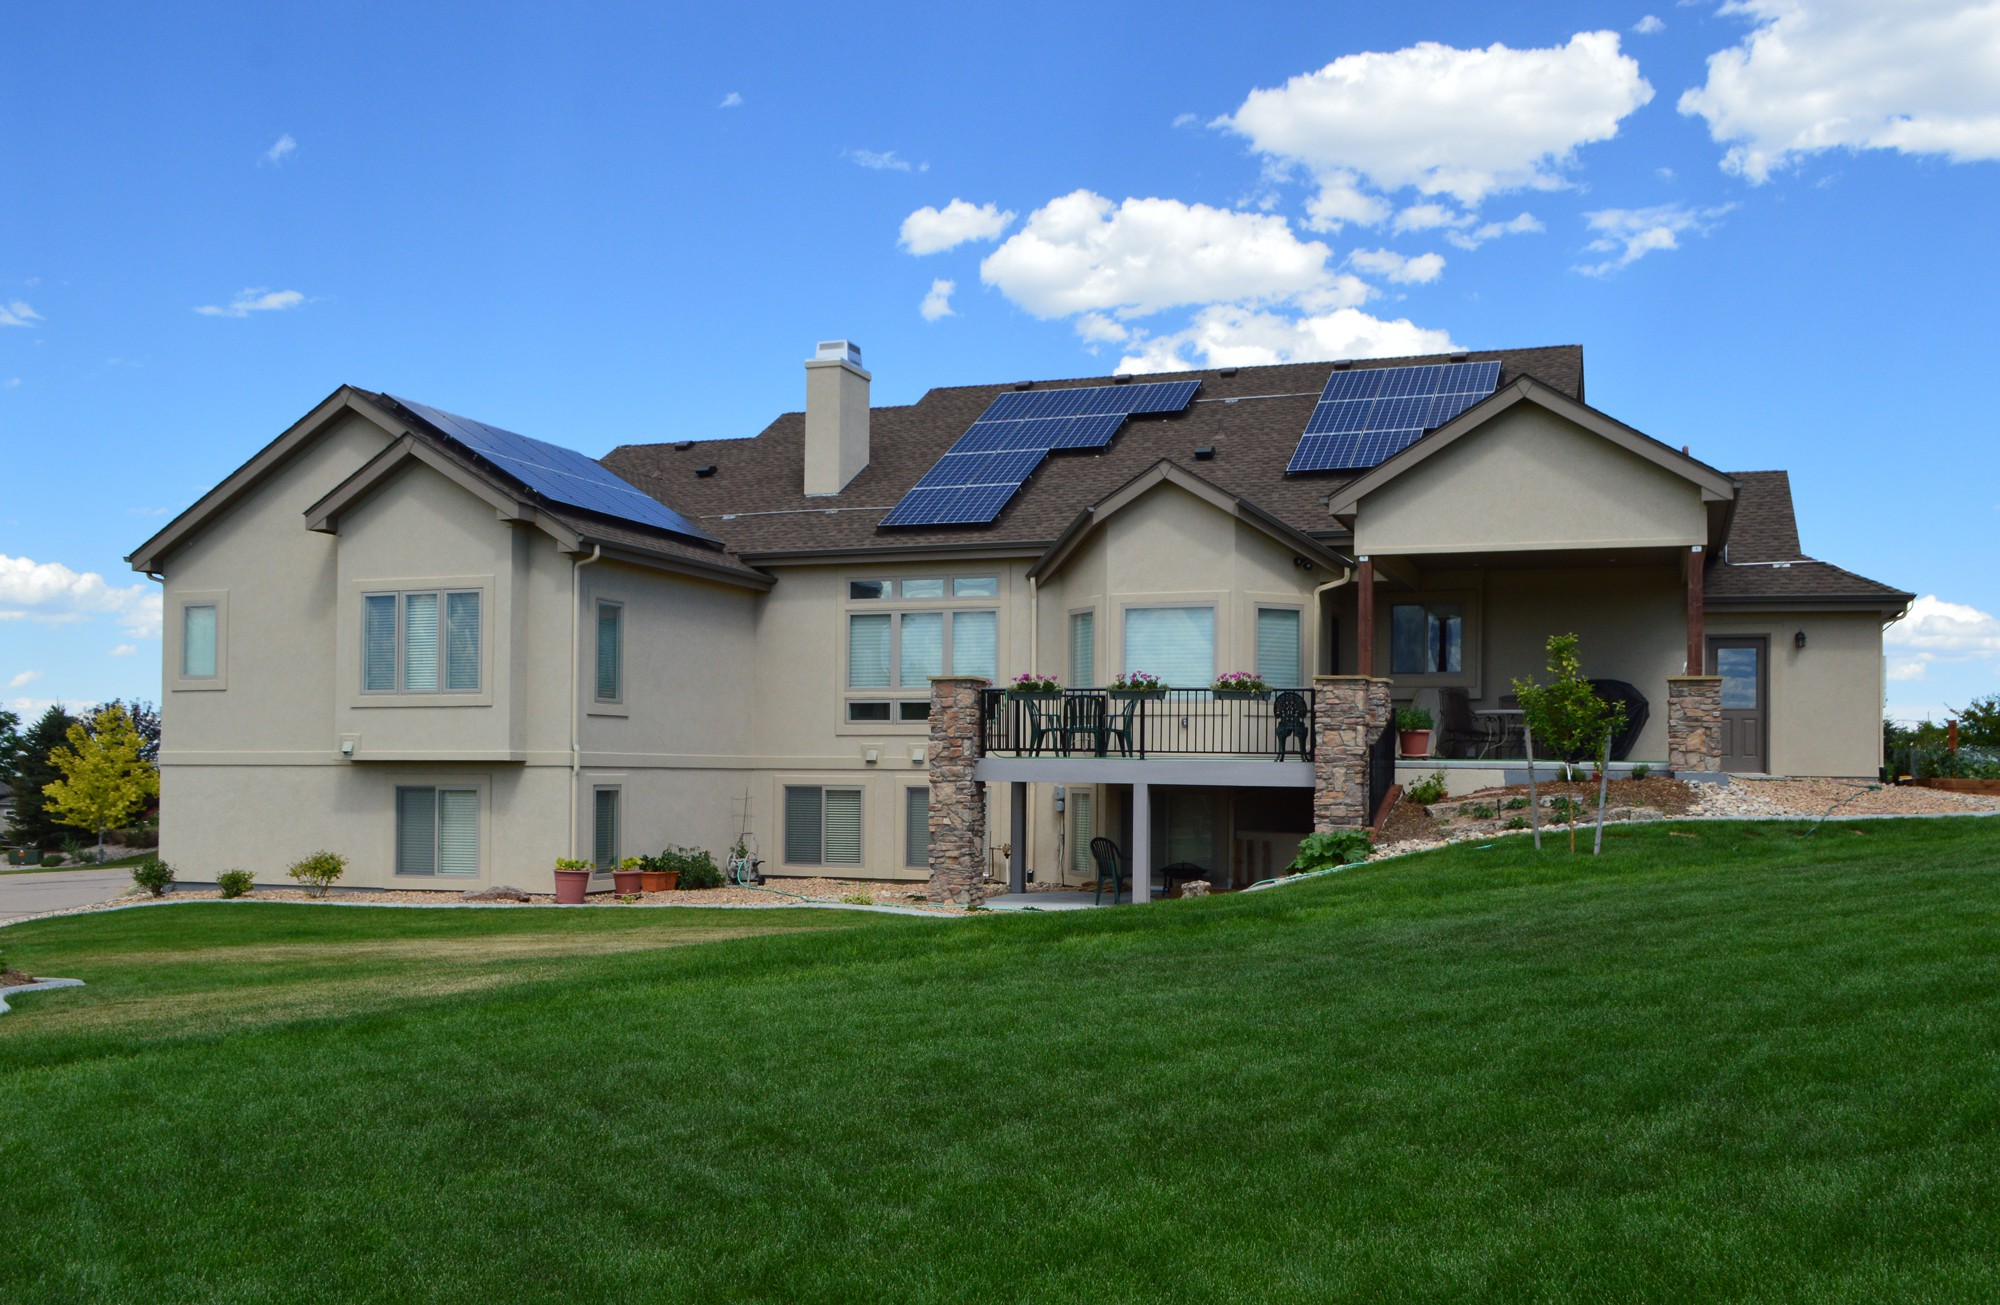 Maximizing a Solar Company's Digital ROI with Inbound Marketing